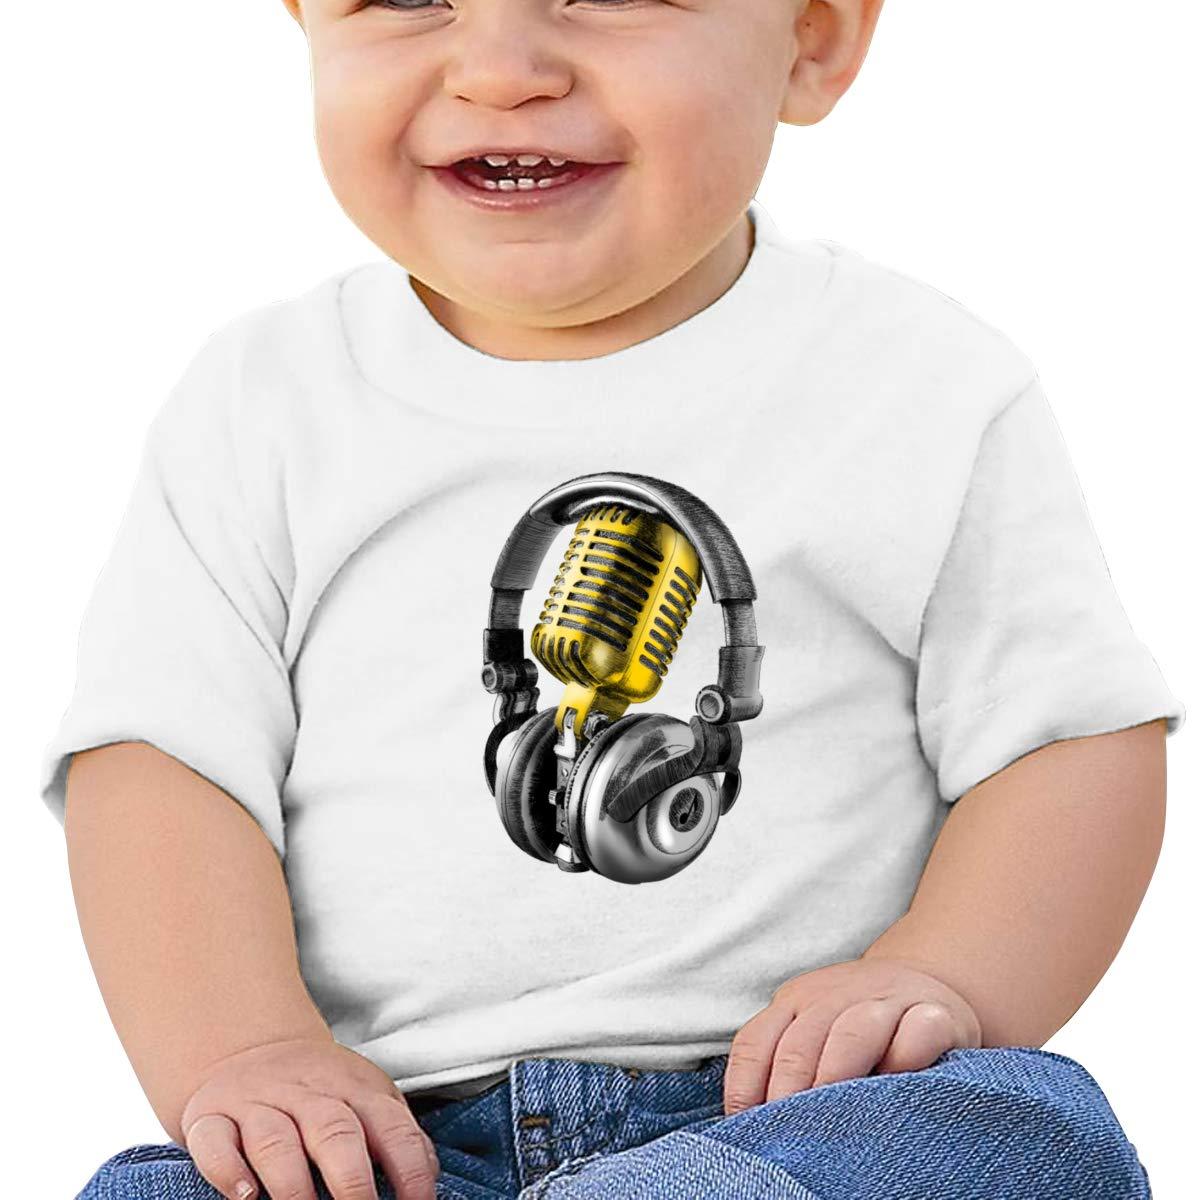 Qiop Nee Microphone and Headphones Short-Sleeves Tee Baby Boy